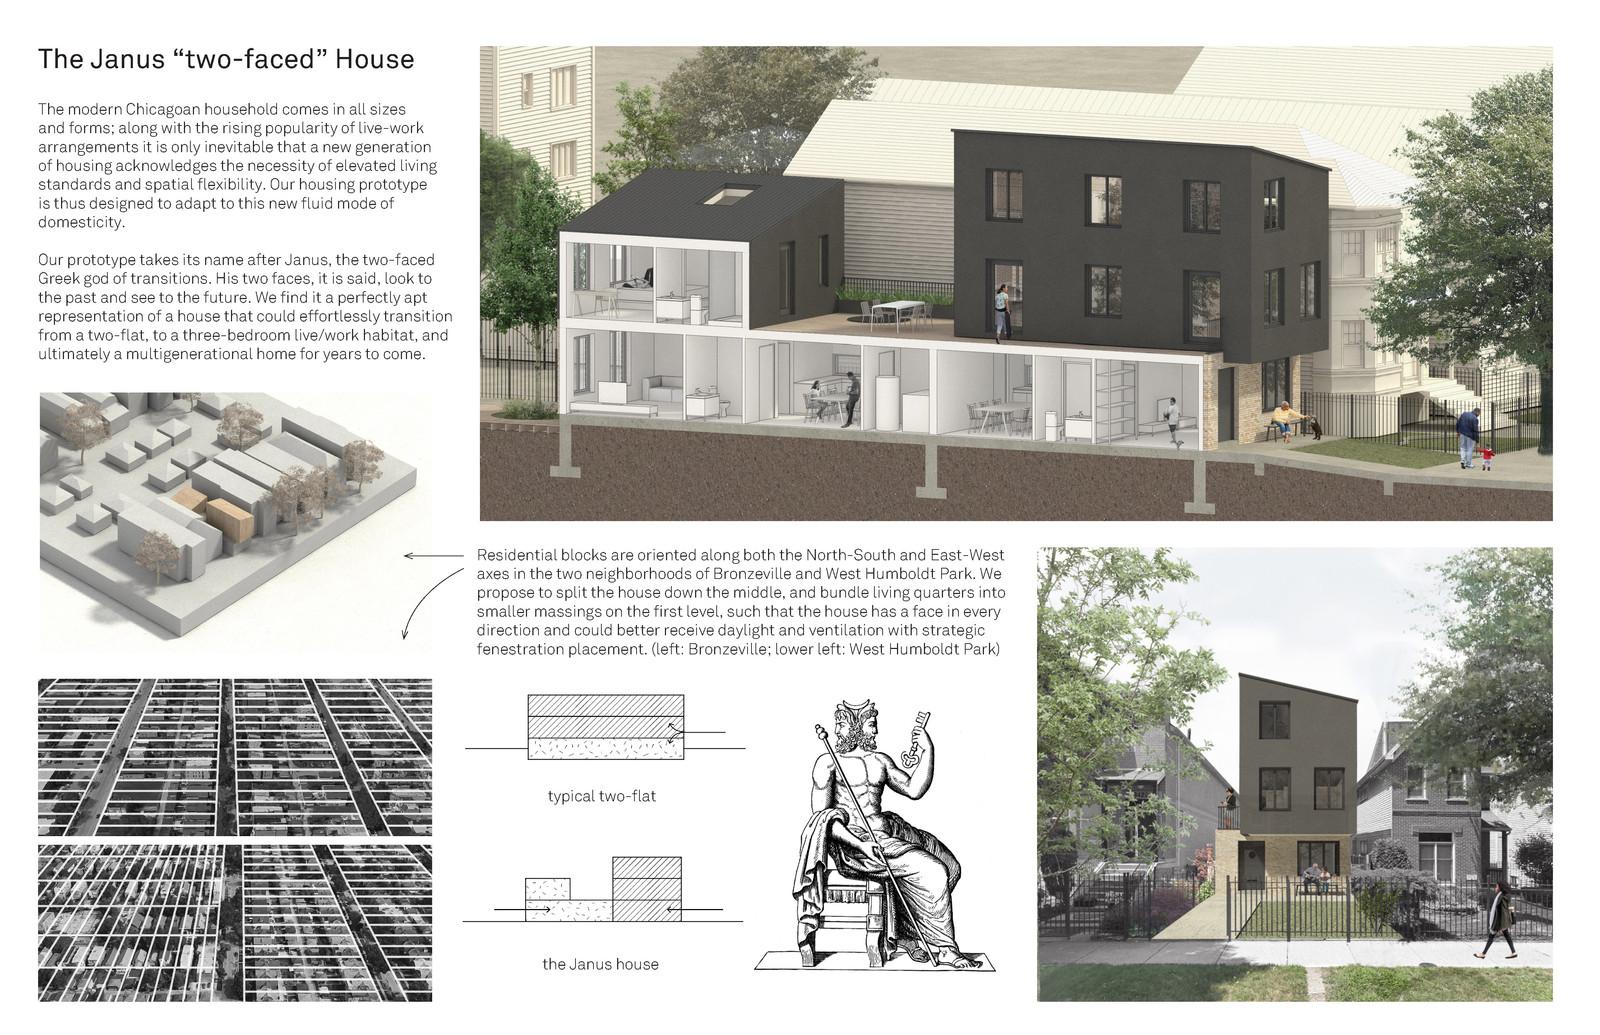 Sensational Phoebe Kung Luke Ocallaghan Team Name Pulp Download Free Architecture Designs Scobabritishbridgeorg